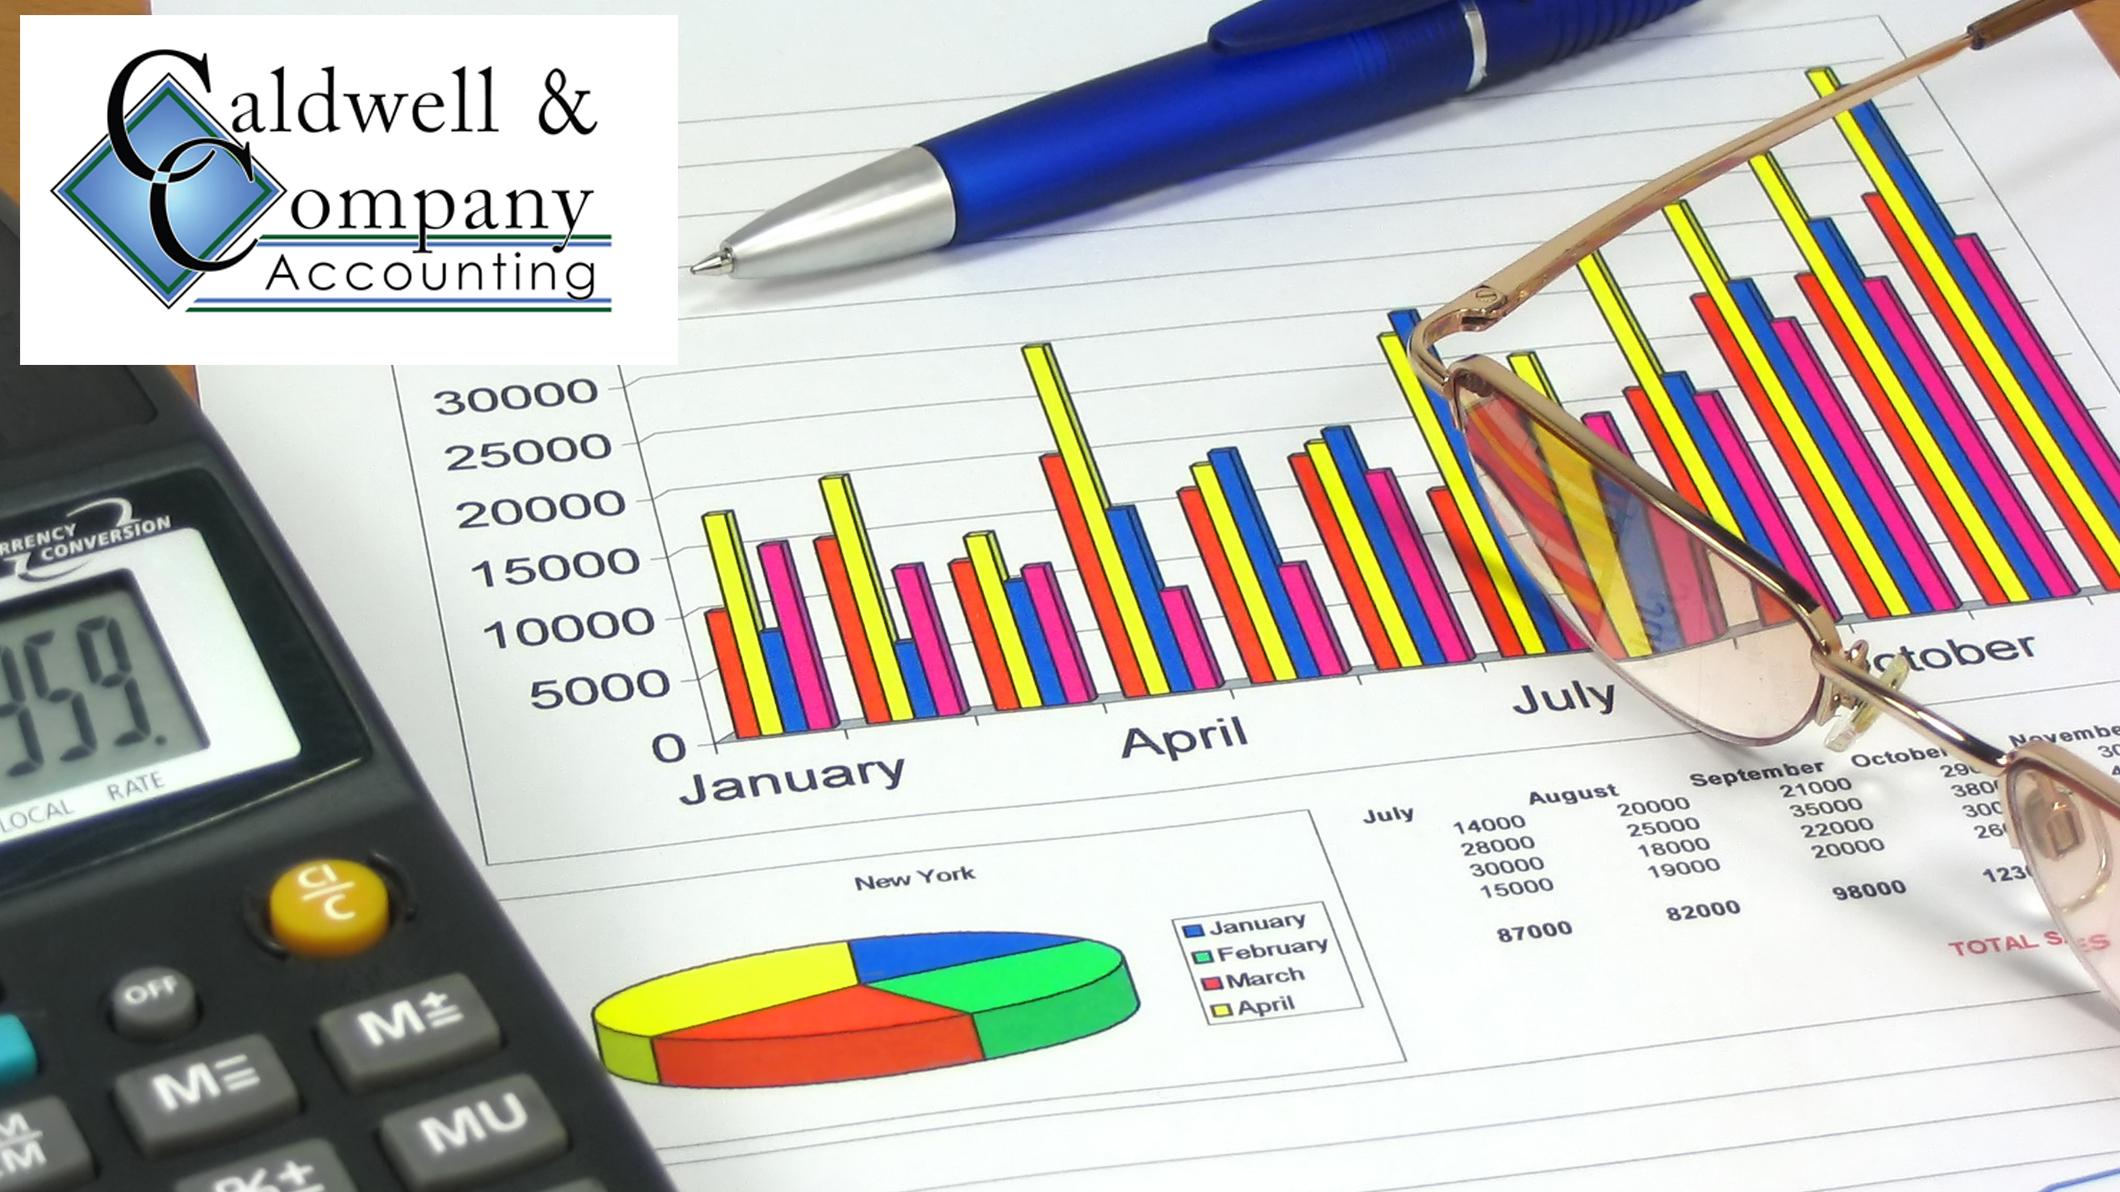 Caldwell & Company Accounting image 0